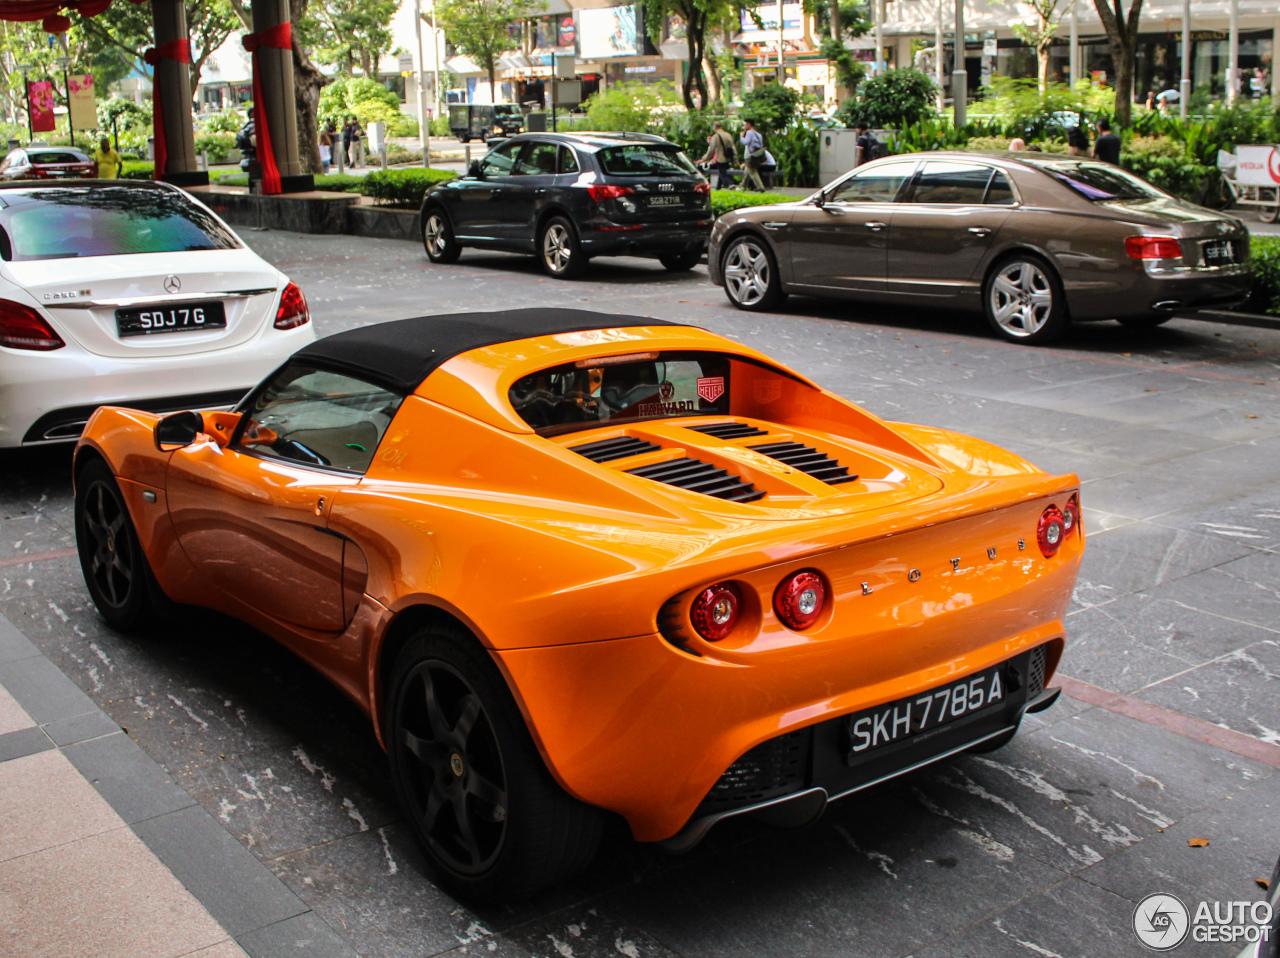 Lotus elise s2 111s 4 february 2017 autogespot 2 i lotus elise s2 111s 2 vanachro Image collections